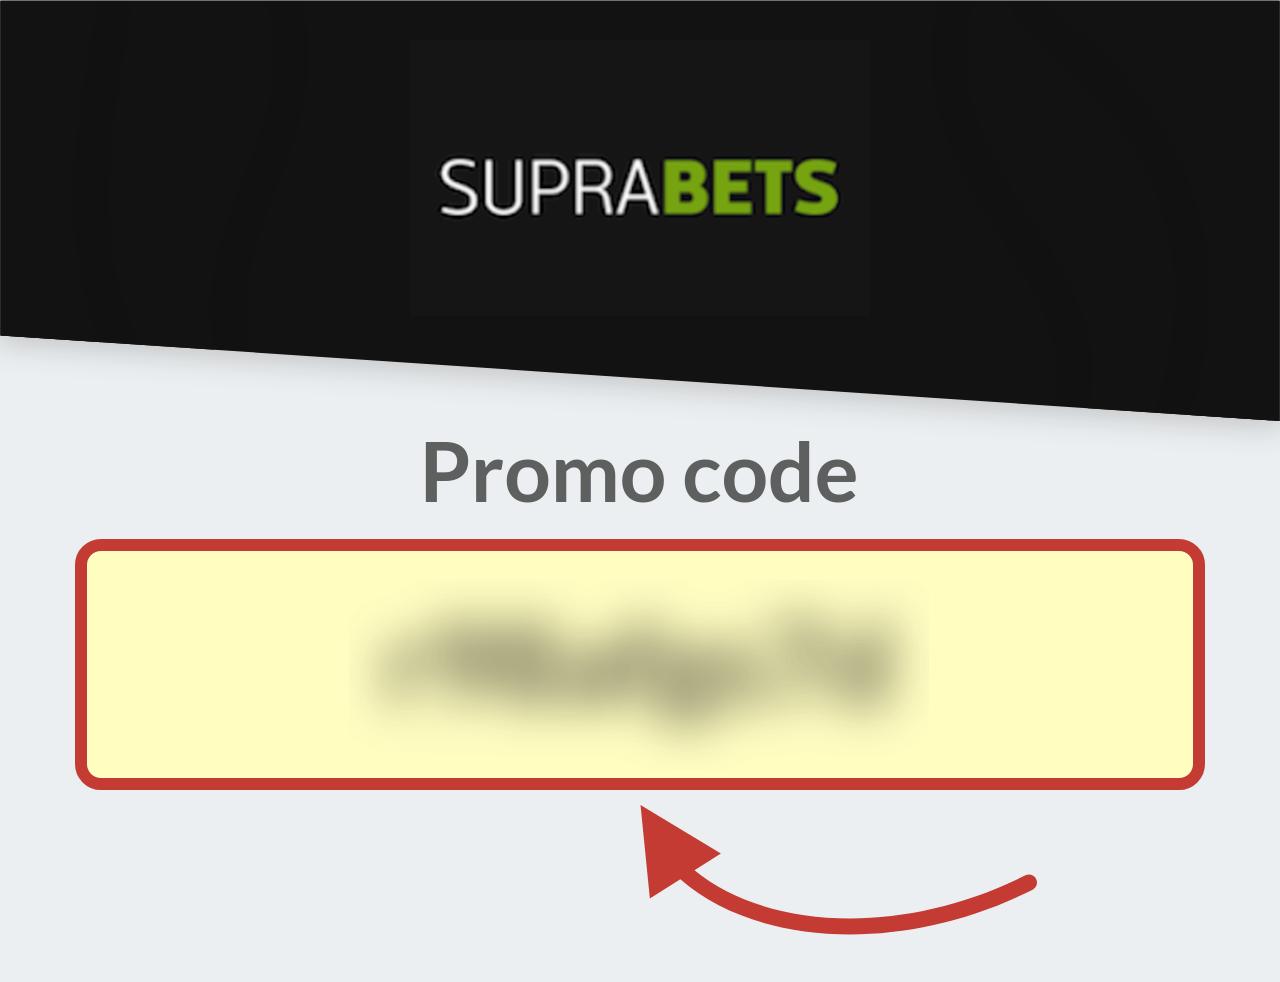 Suprabets Promo Code